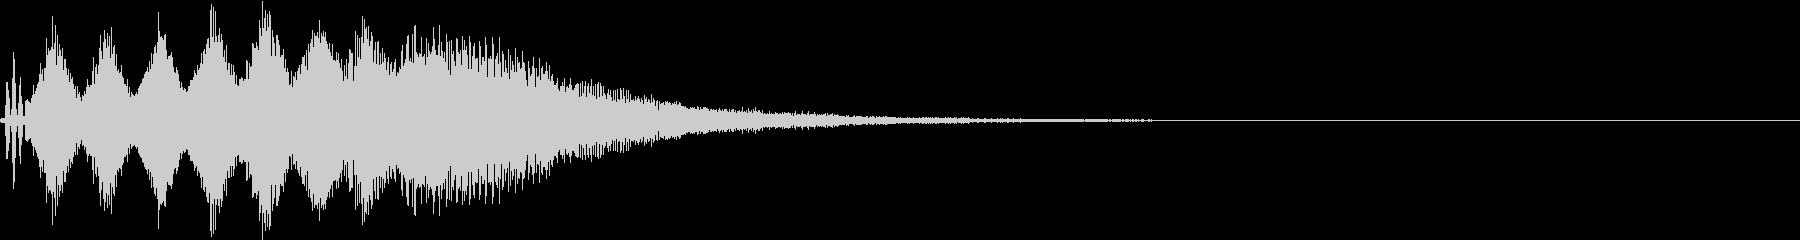 TVFX 目立たせ・アイキャッチ 19の未再生の波形